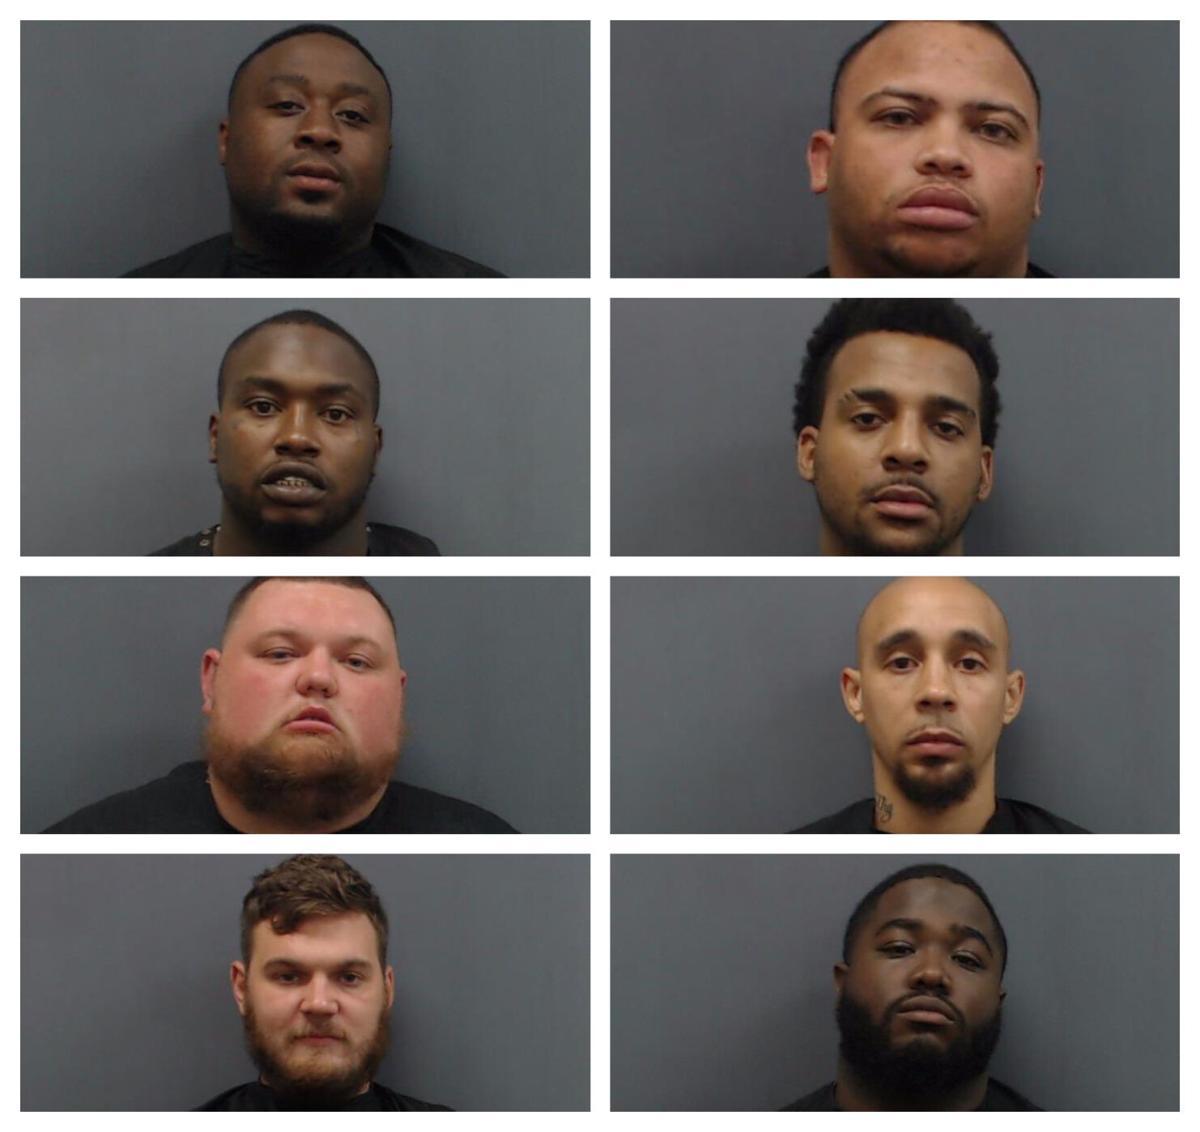 Organized criminal activity arrests Kilgore